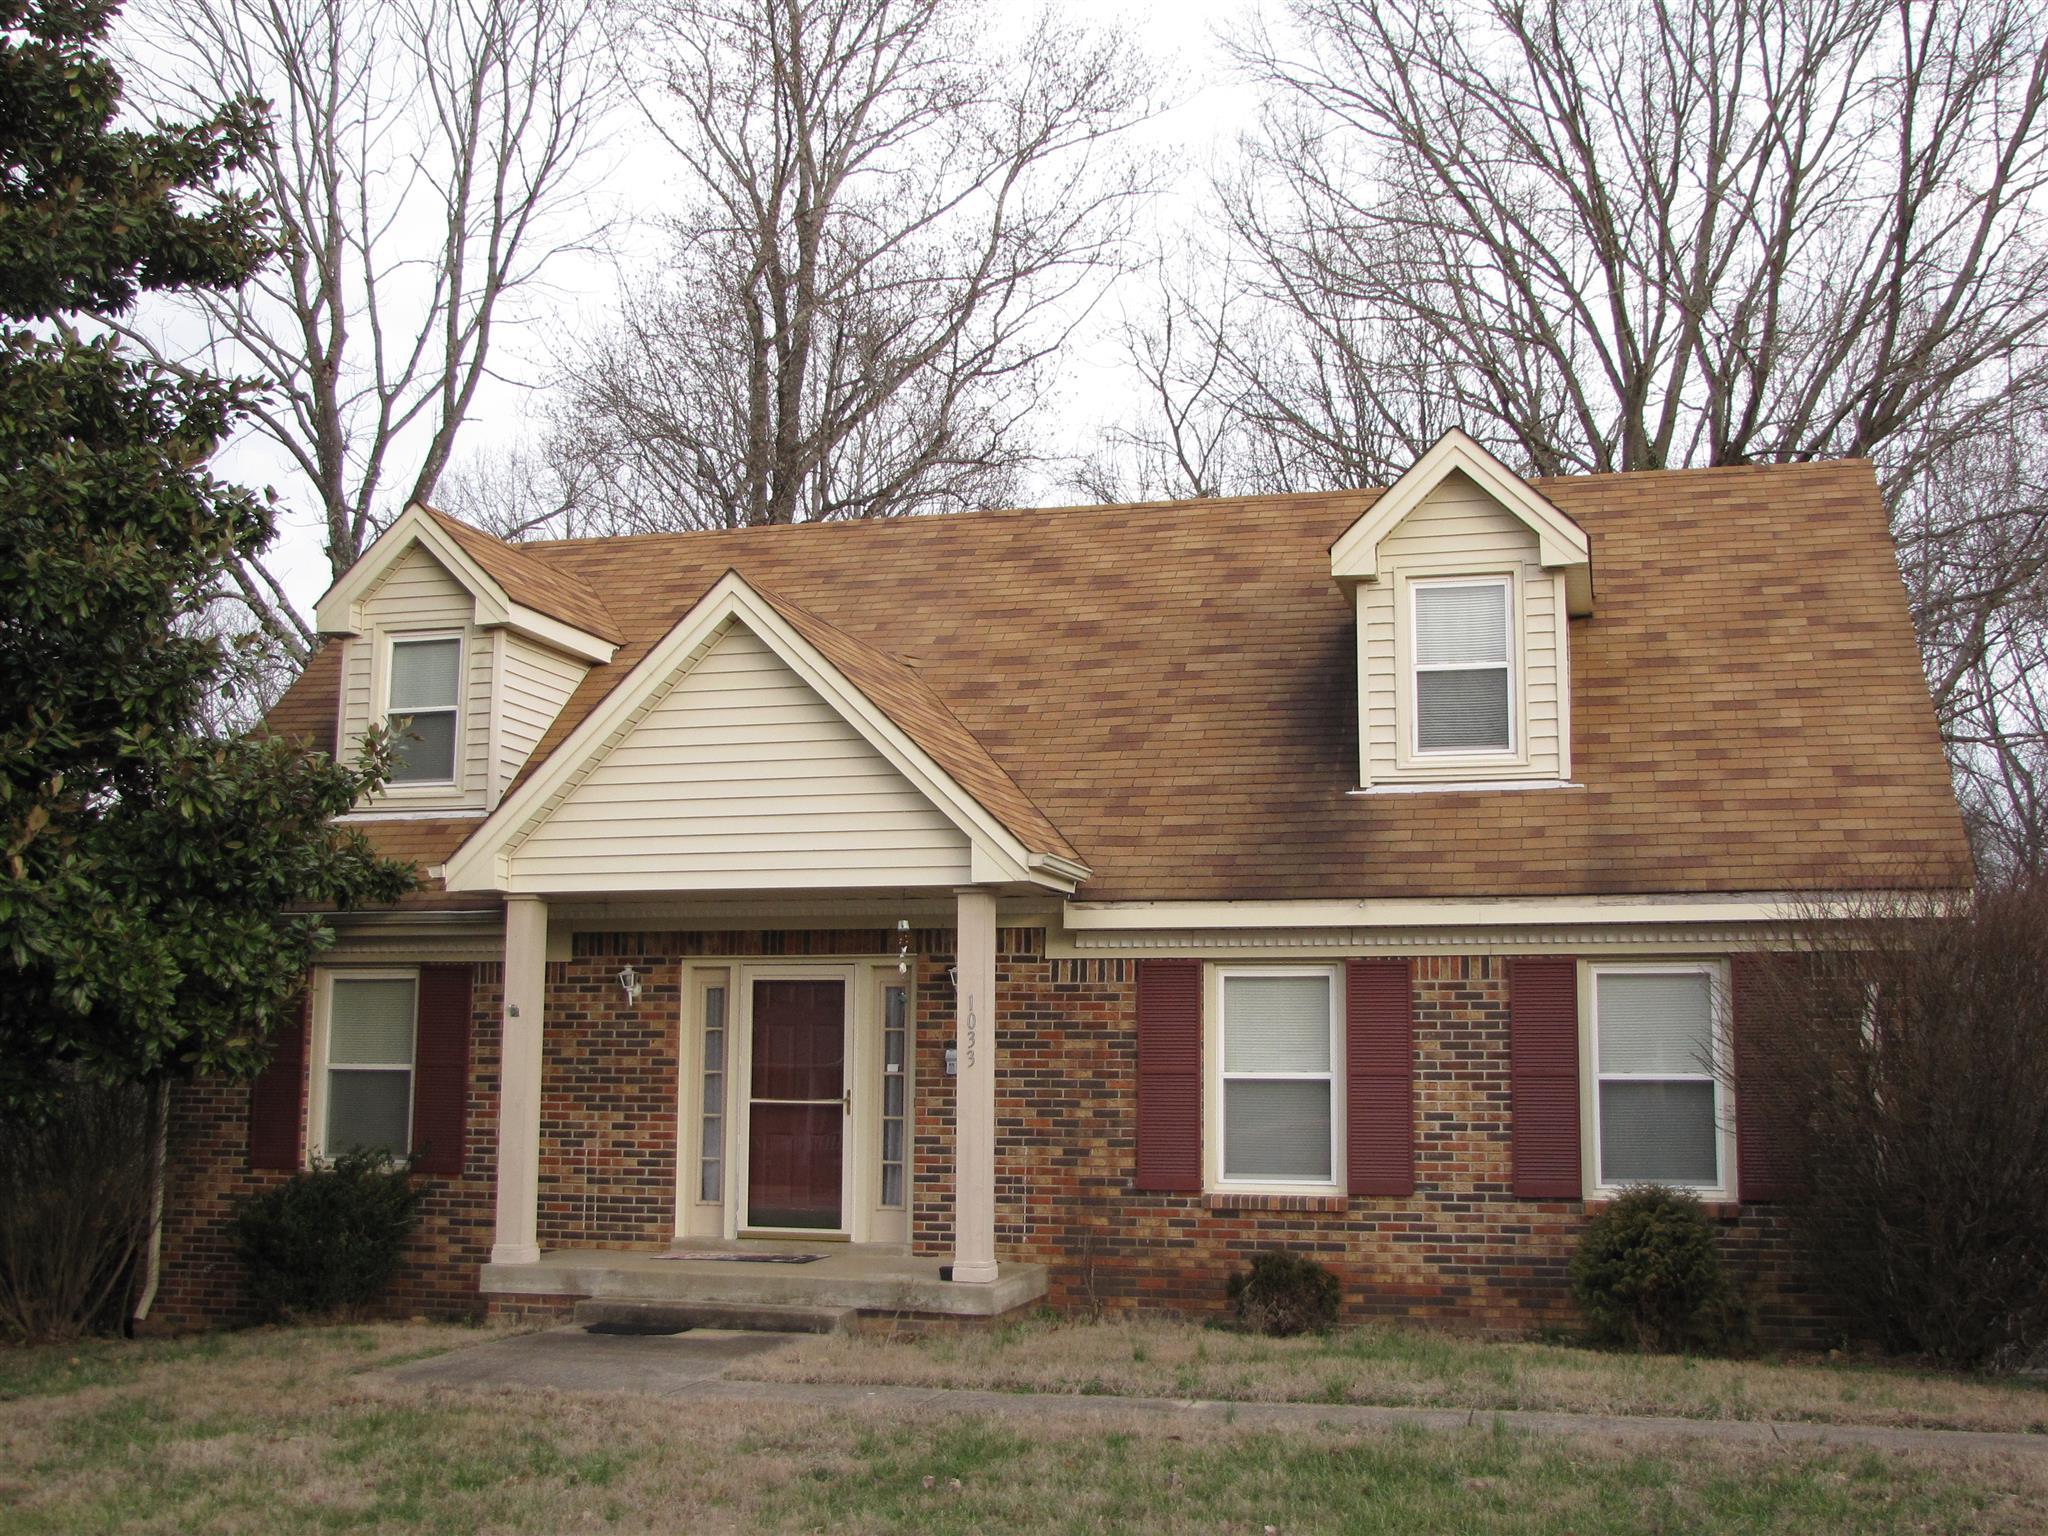 1033 Foxmoor Dr, Clarksville, TN 37042